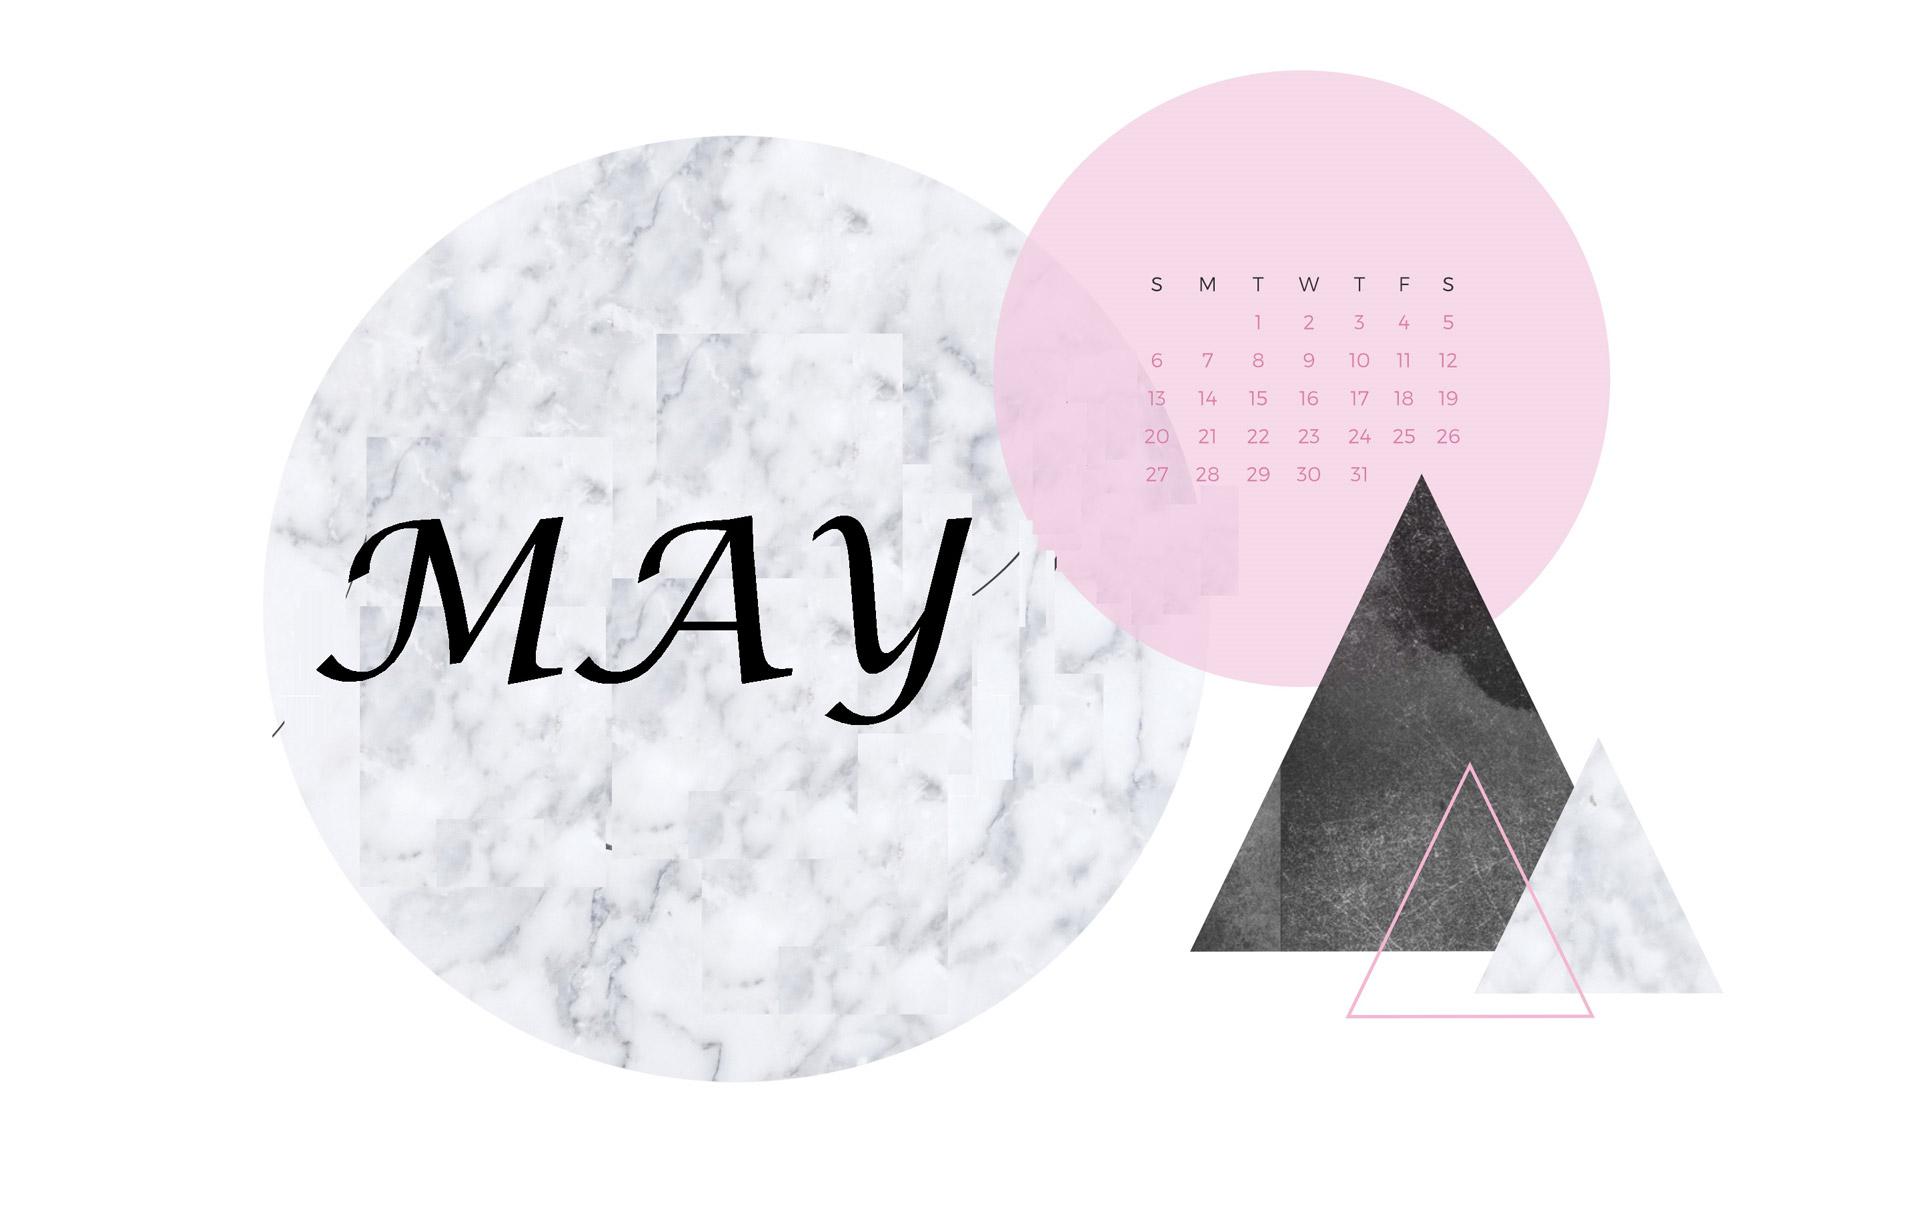 hinh-nen-chao-thang-5-hello-may-14